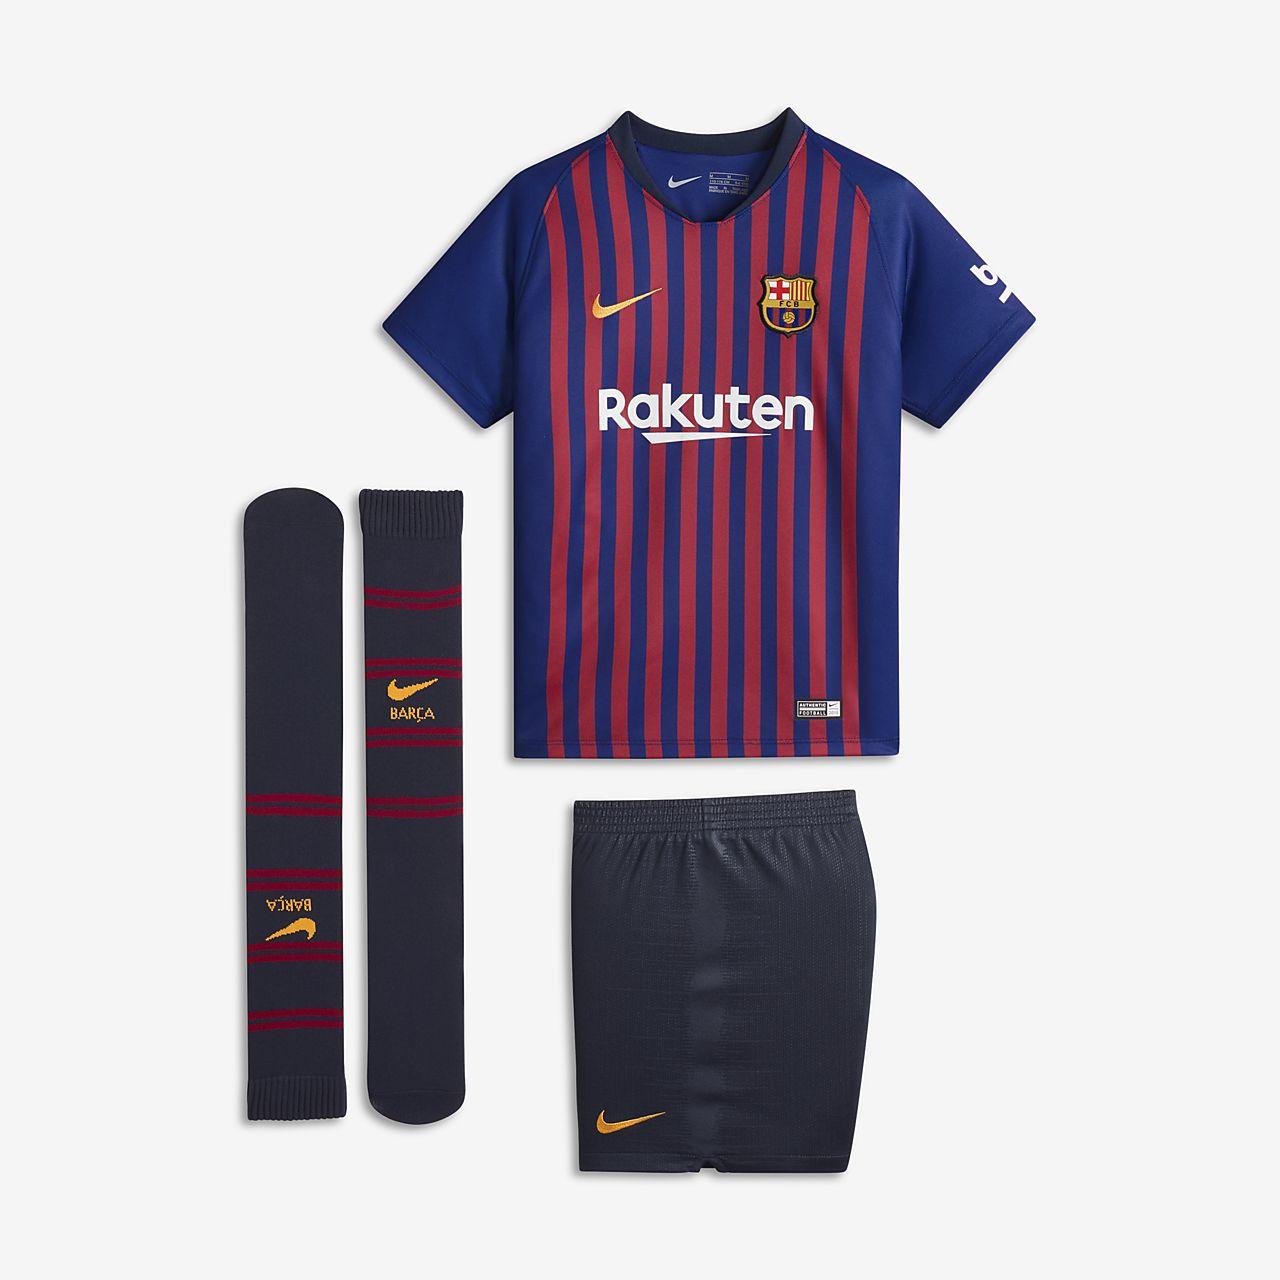 2018/19 FC Barcelona Stadium Home Fußballtrikot-Set für jüngere Kinder